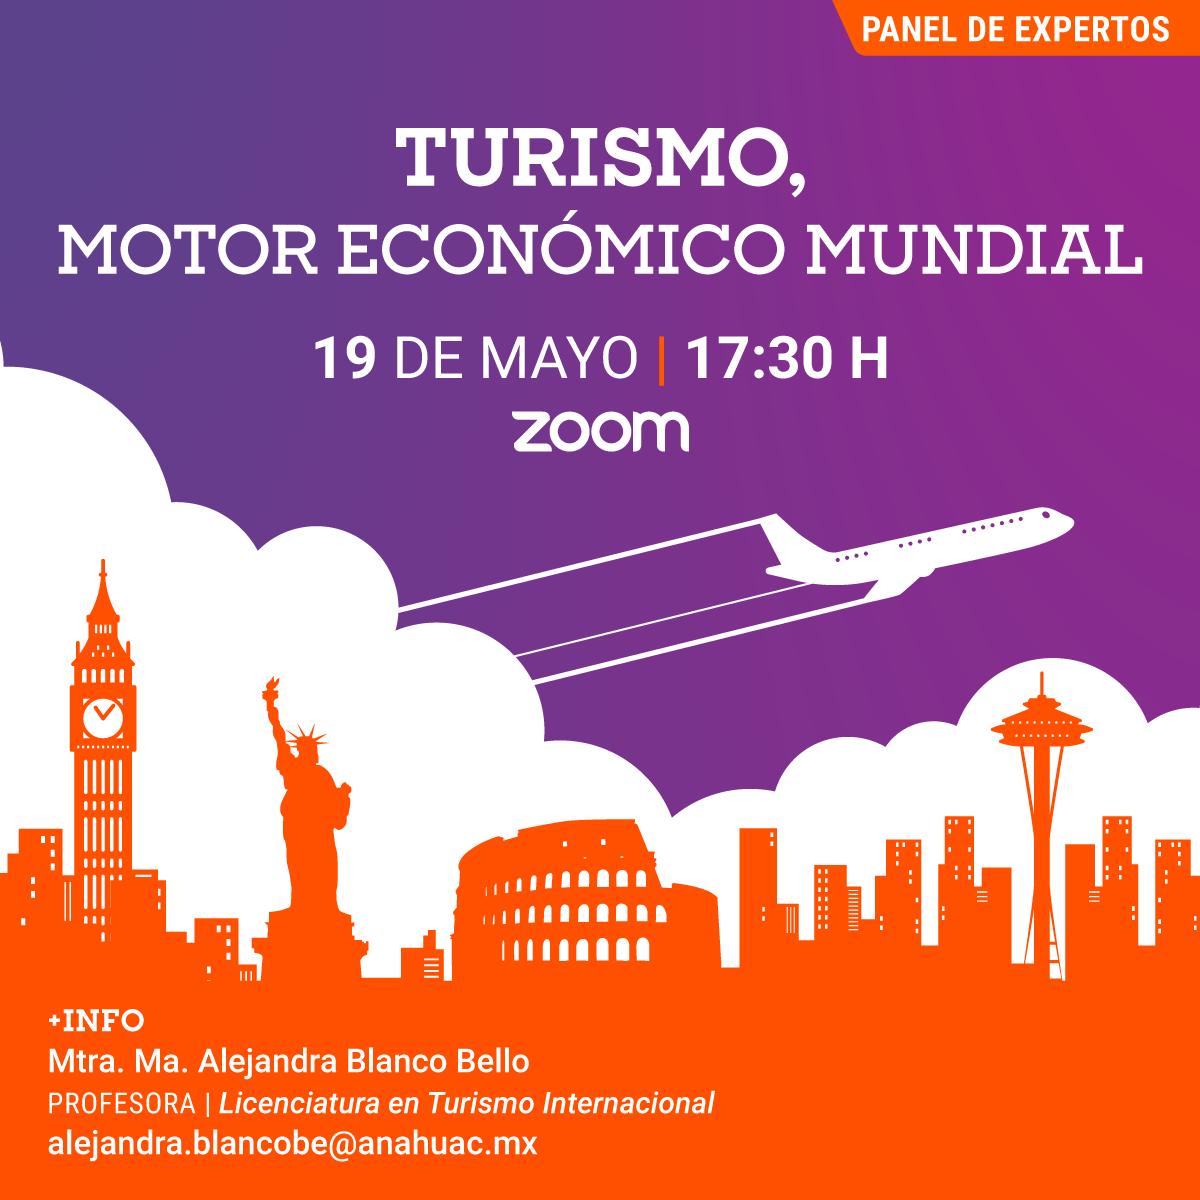 Turismo: Motor Económico Mundial